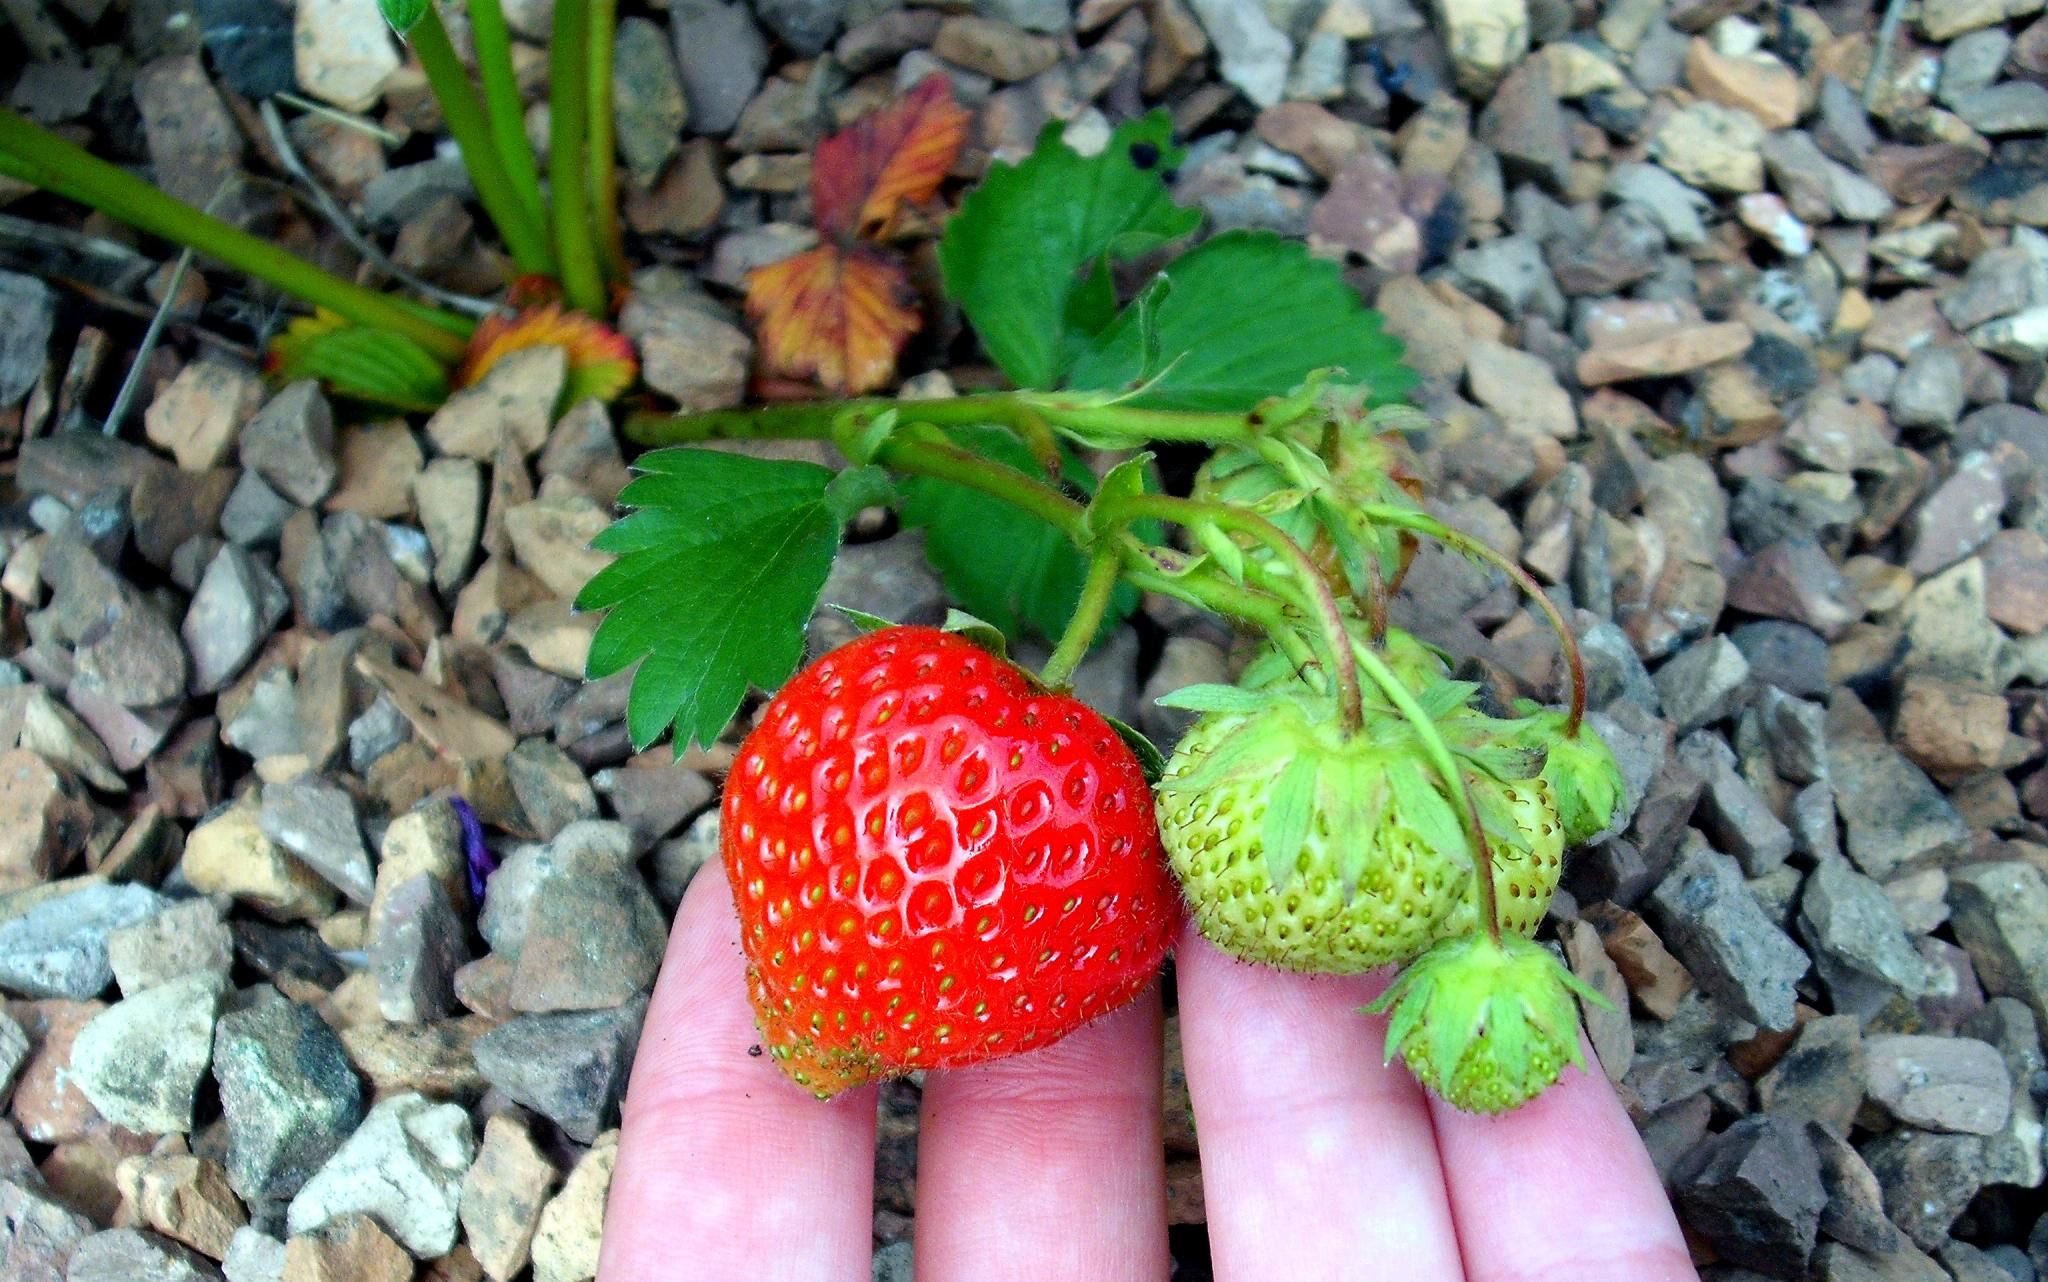 A ripening strawberry